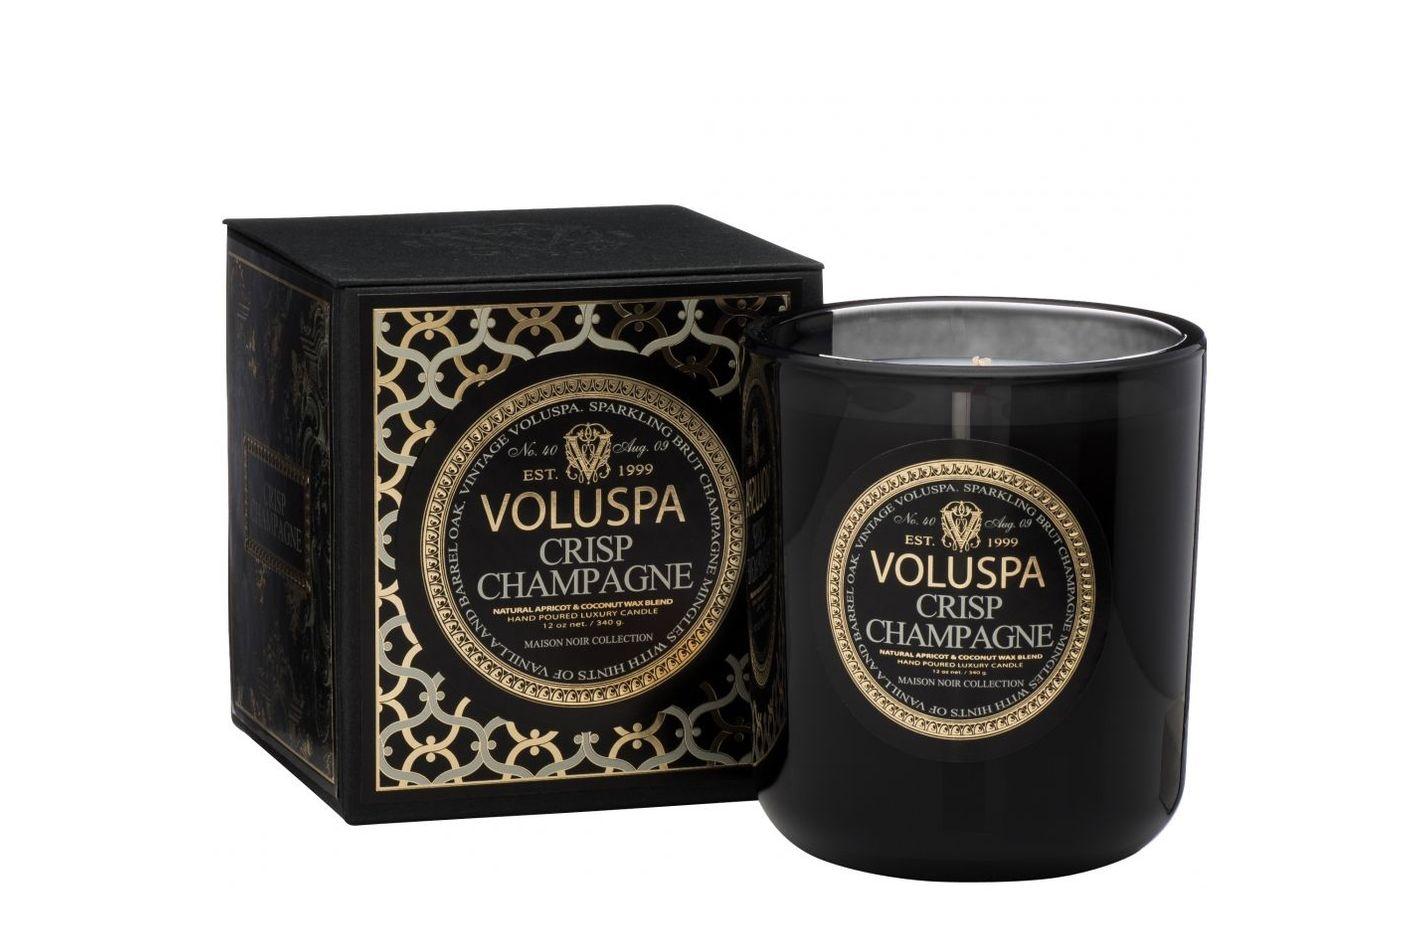 Voluspa crisp champagne